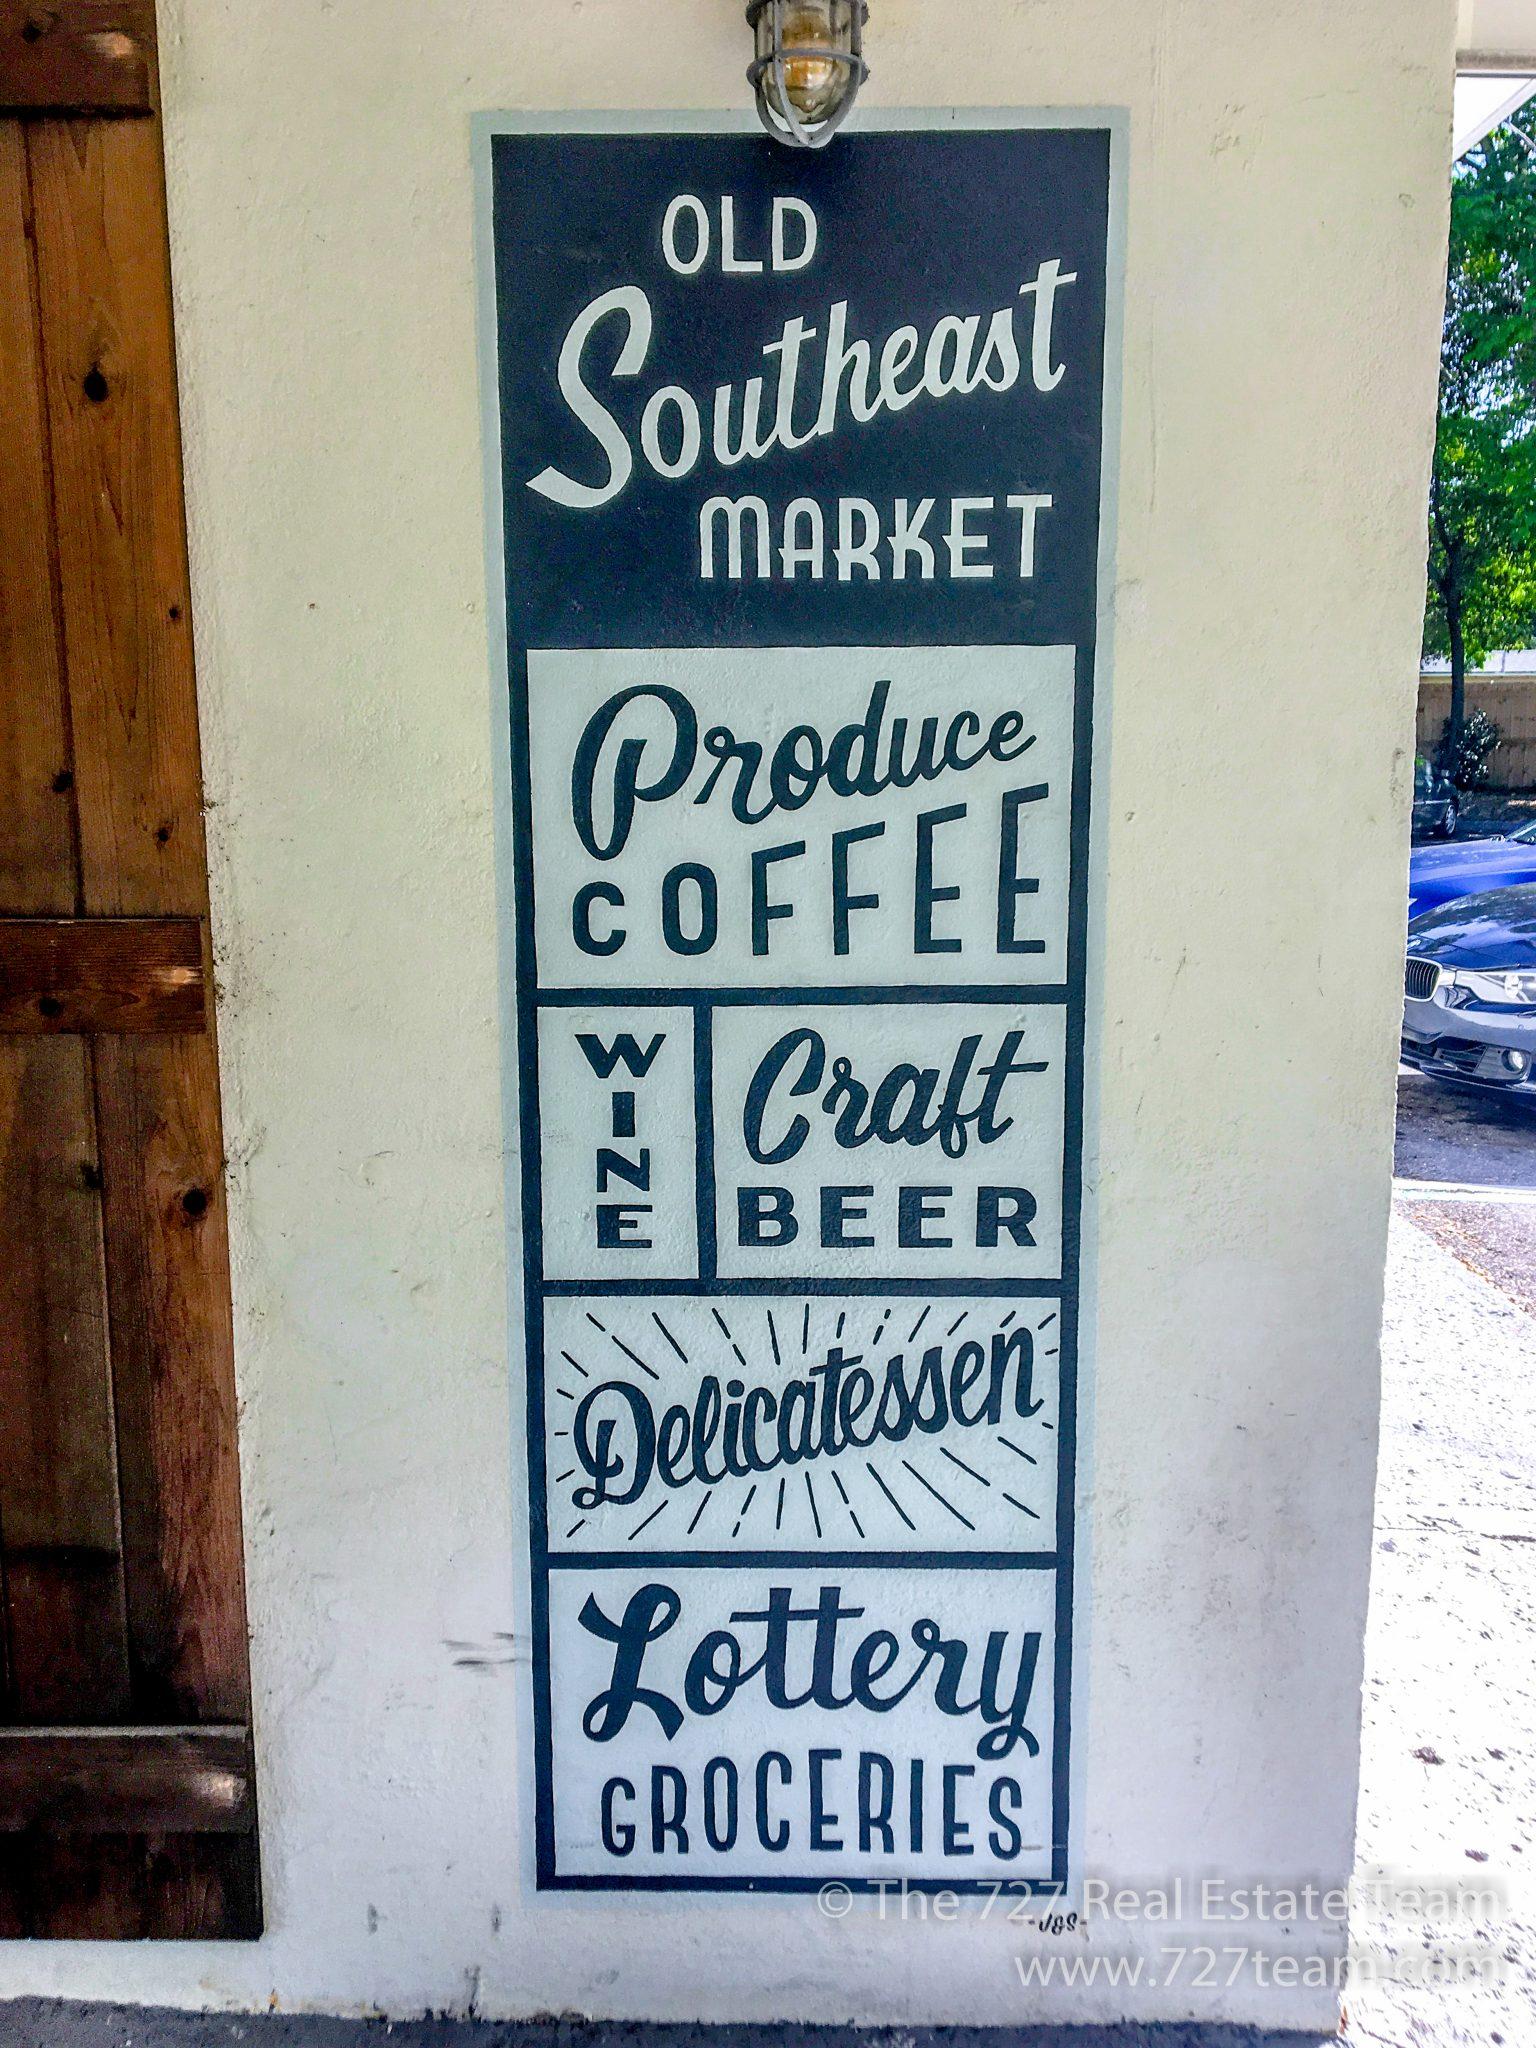 Old southeast market